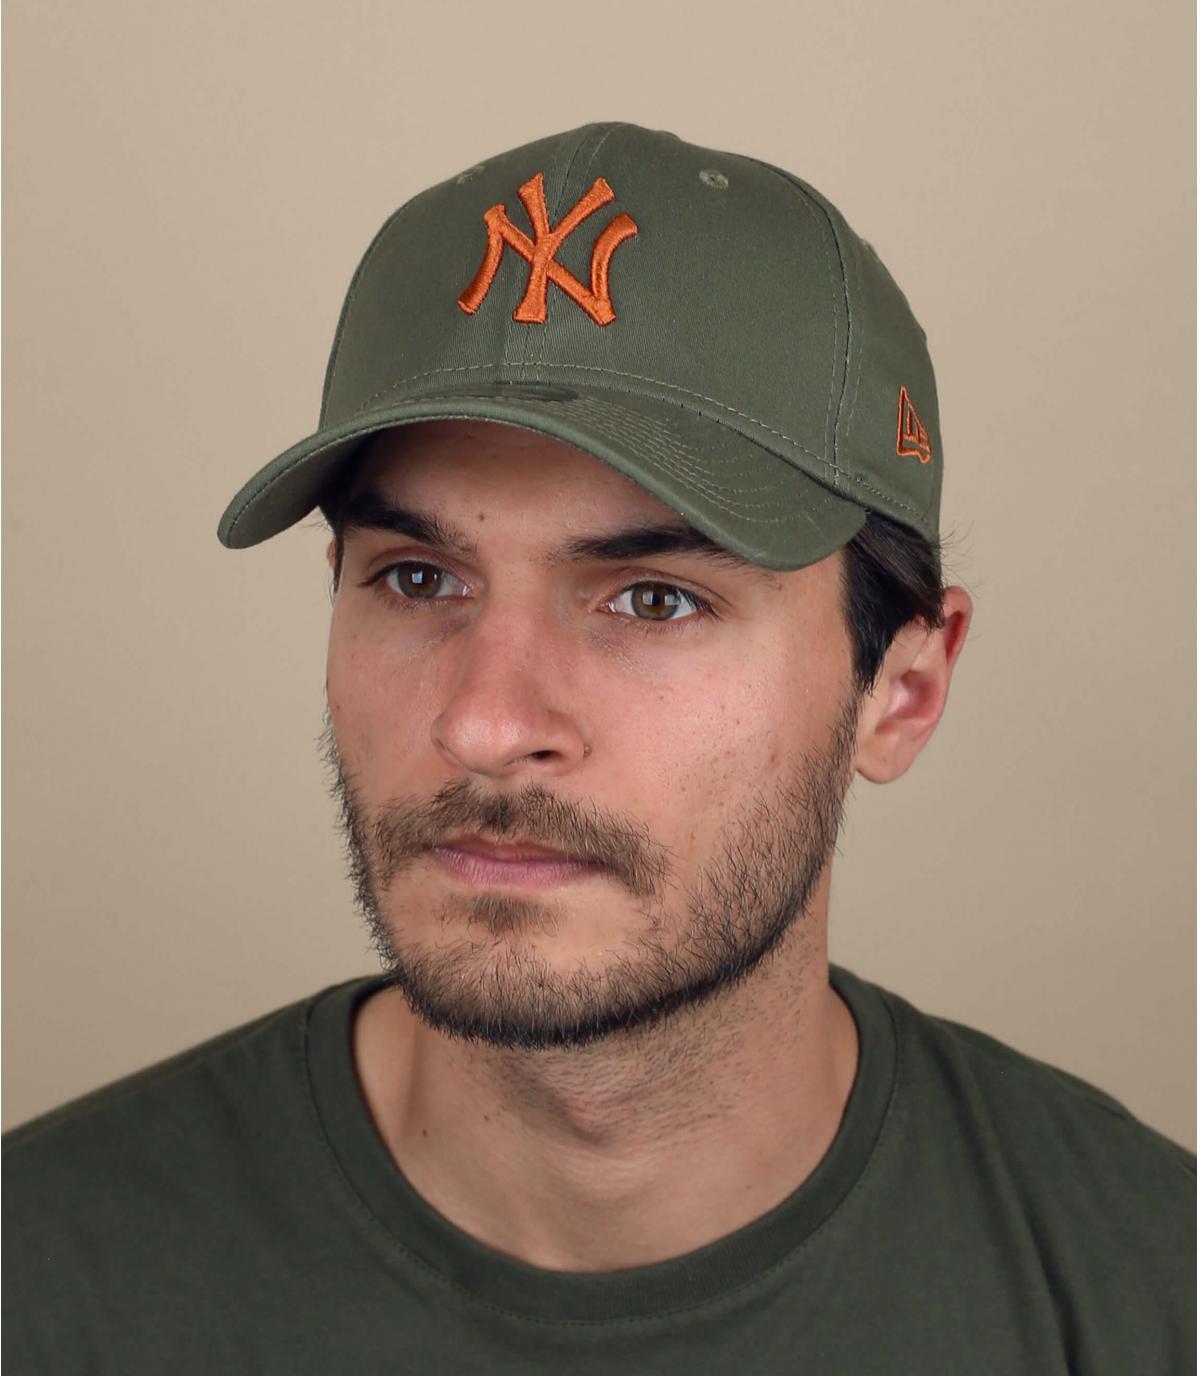 stretch cap NY groen oranje